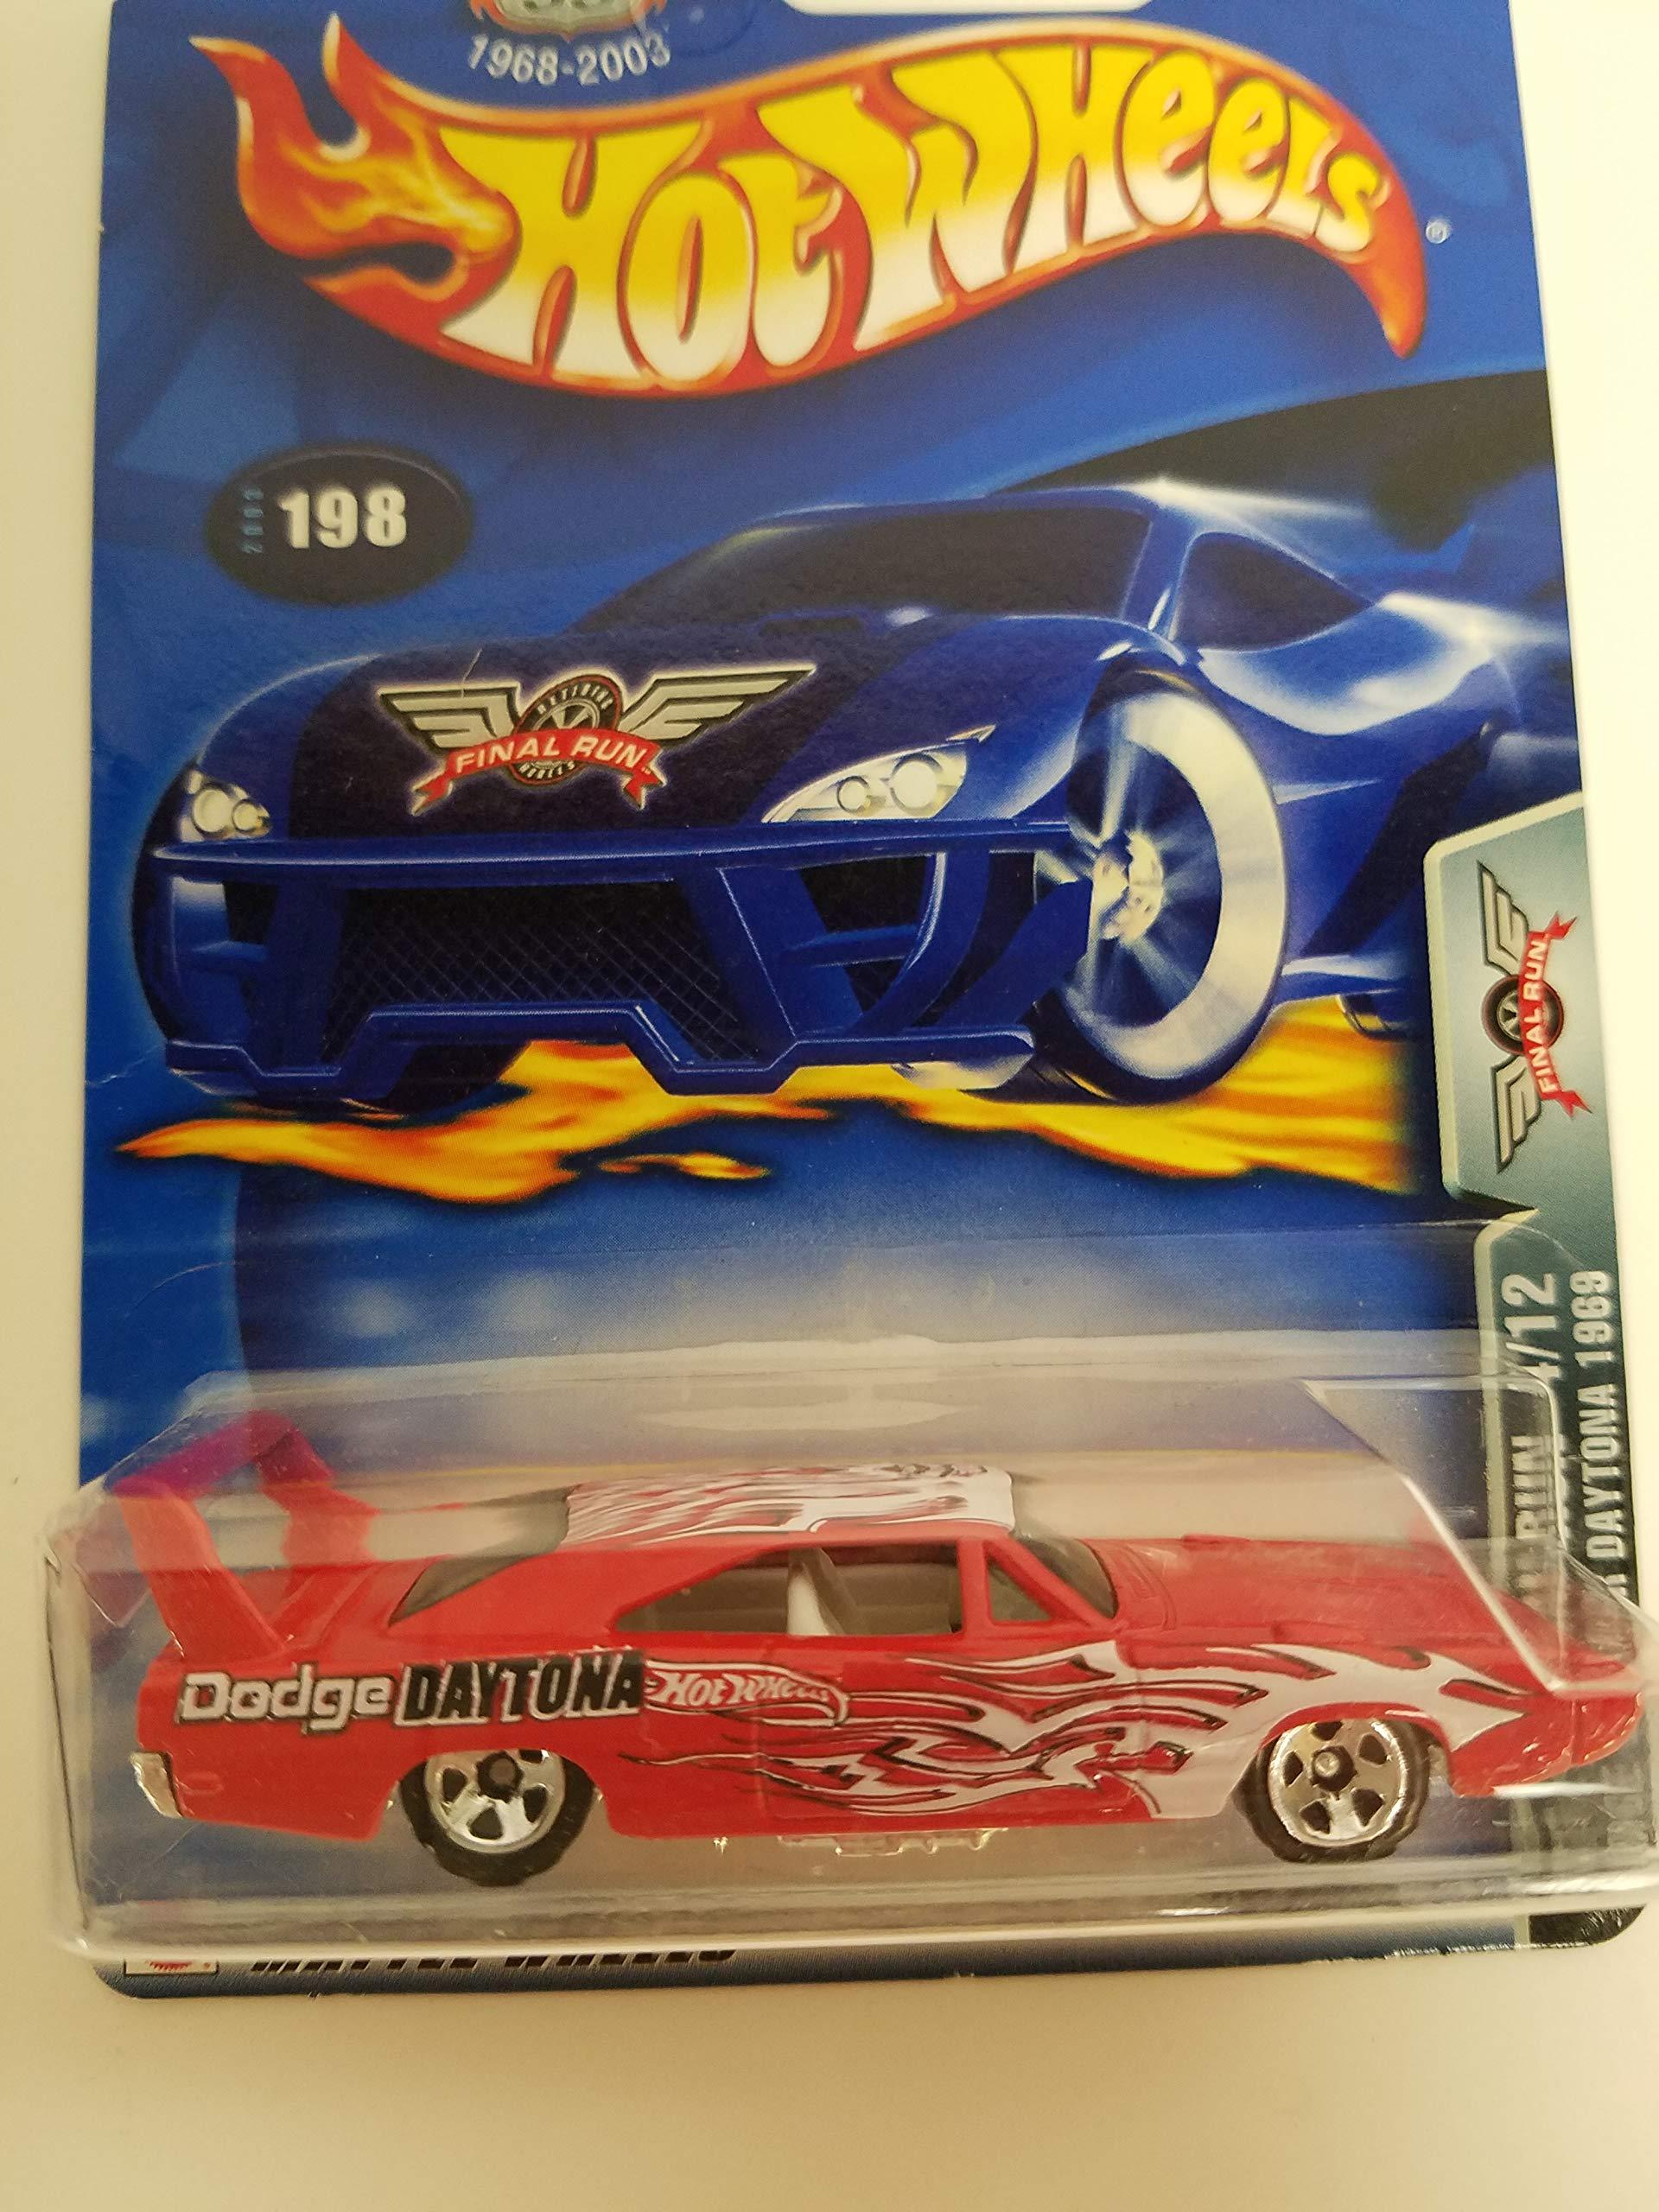 Dodge Charger Daytona 1969 Final Run 4/12 2003 Hot Wheels diecast car No. 198